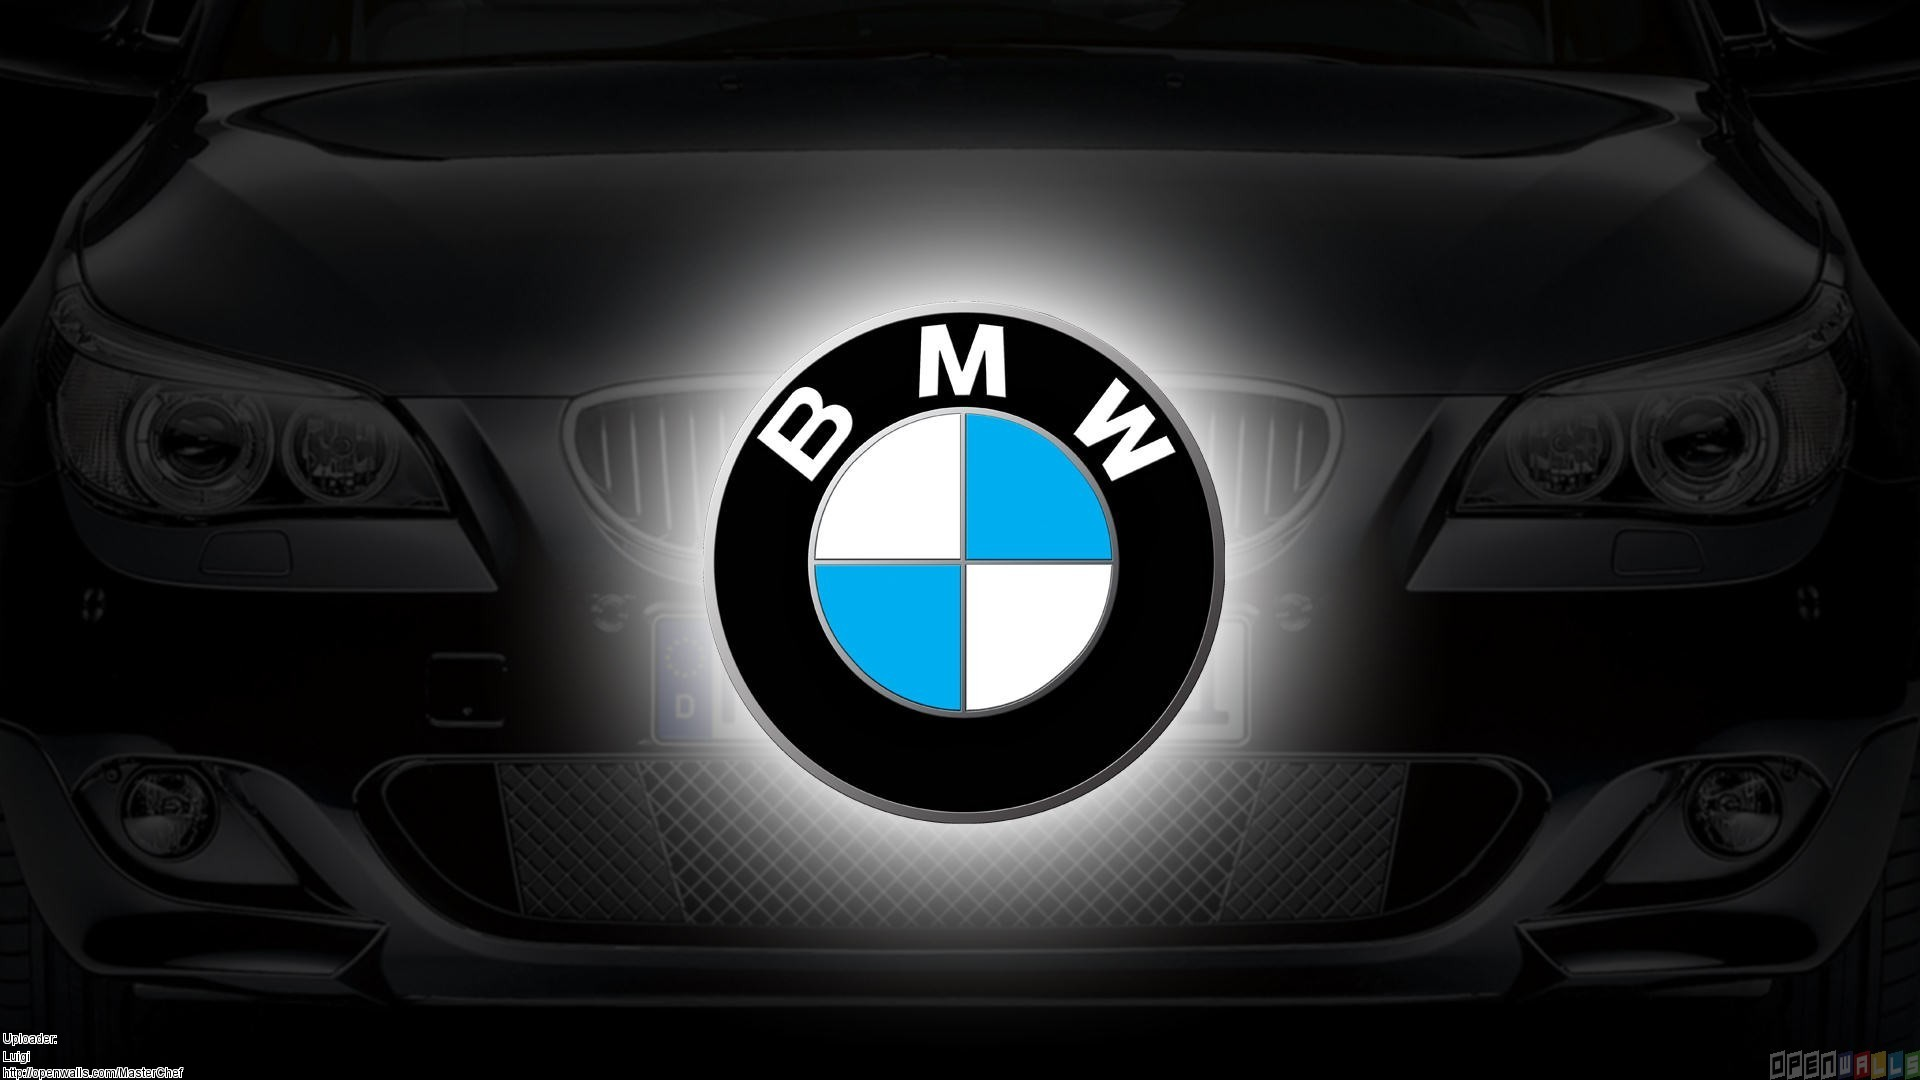 Bmw logo wallpaper 24244   Open Walls 1920x1080